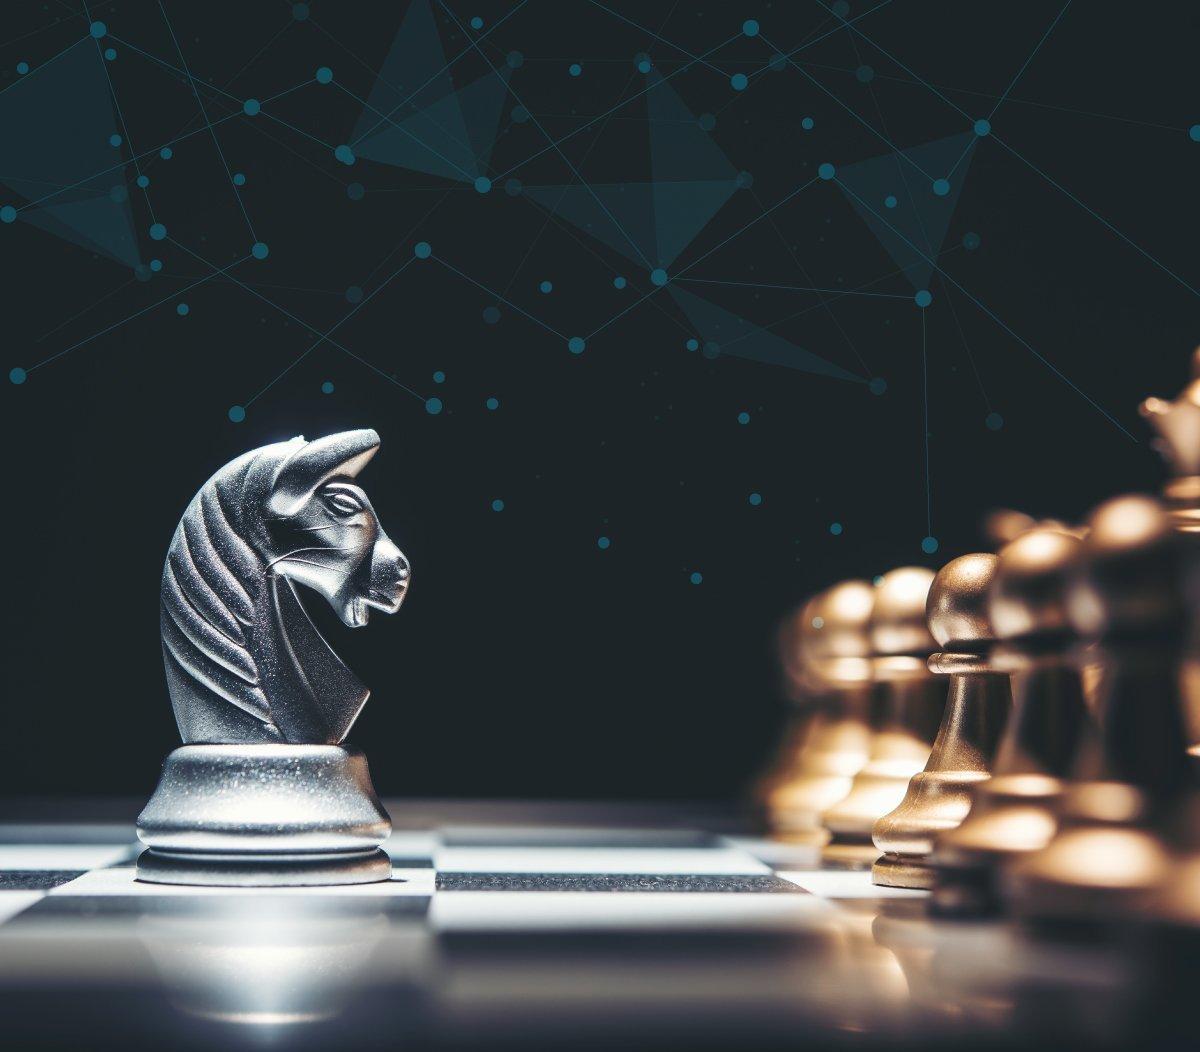 Big Data o Business Intelligence: ¿Cuáles son sus diferencias?